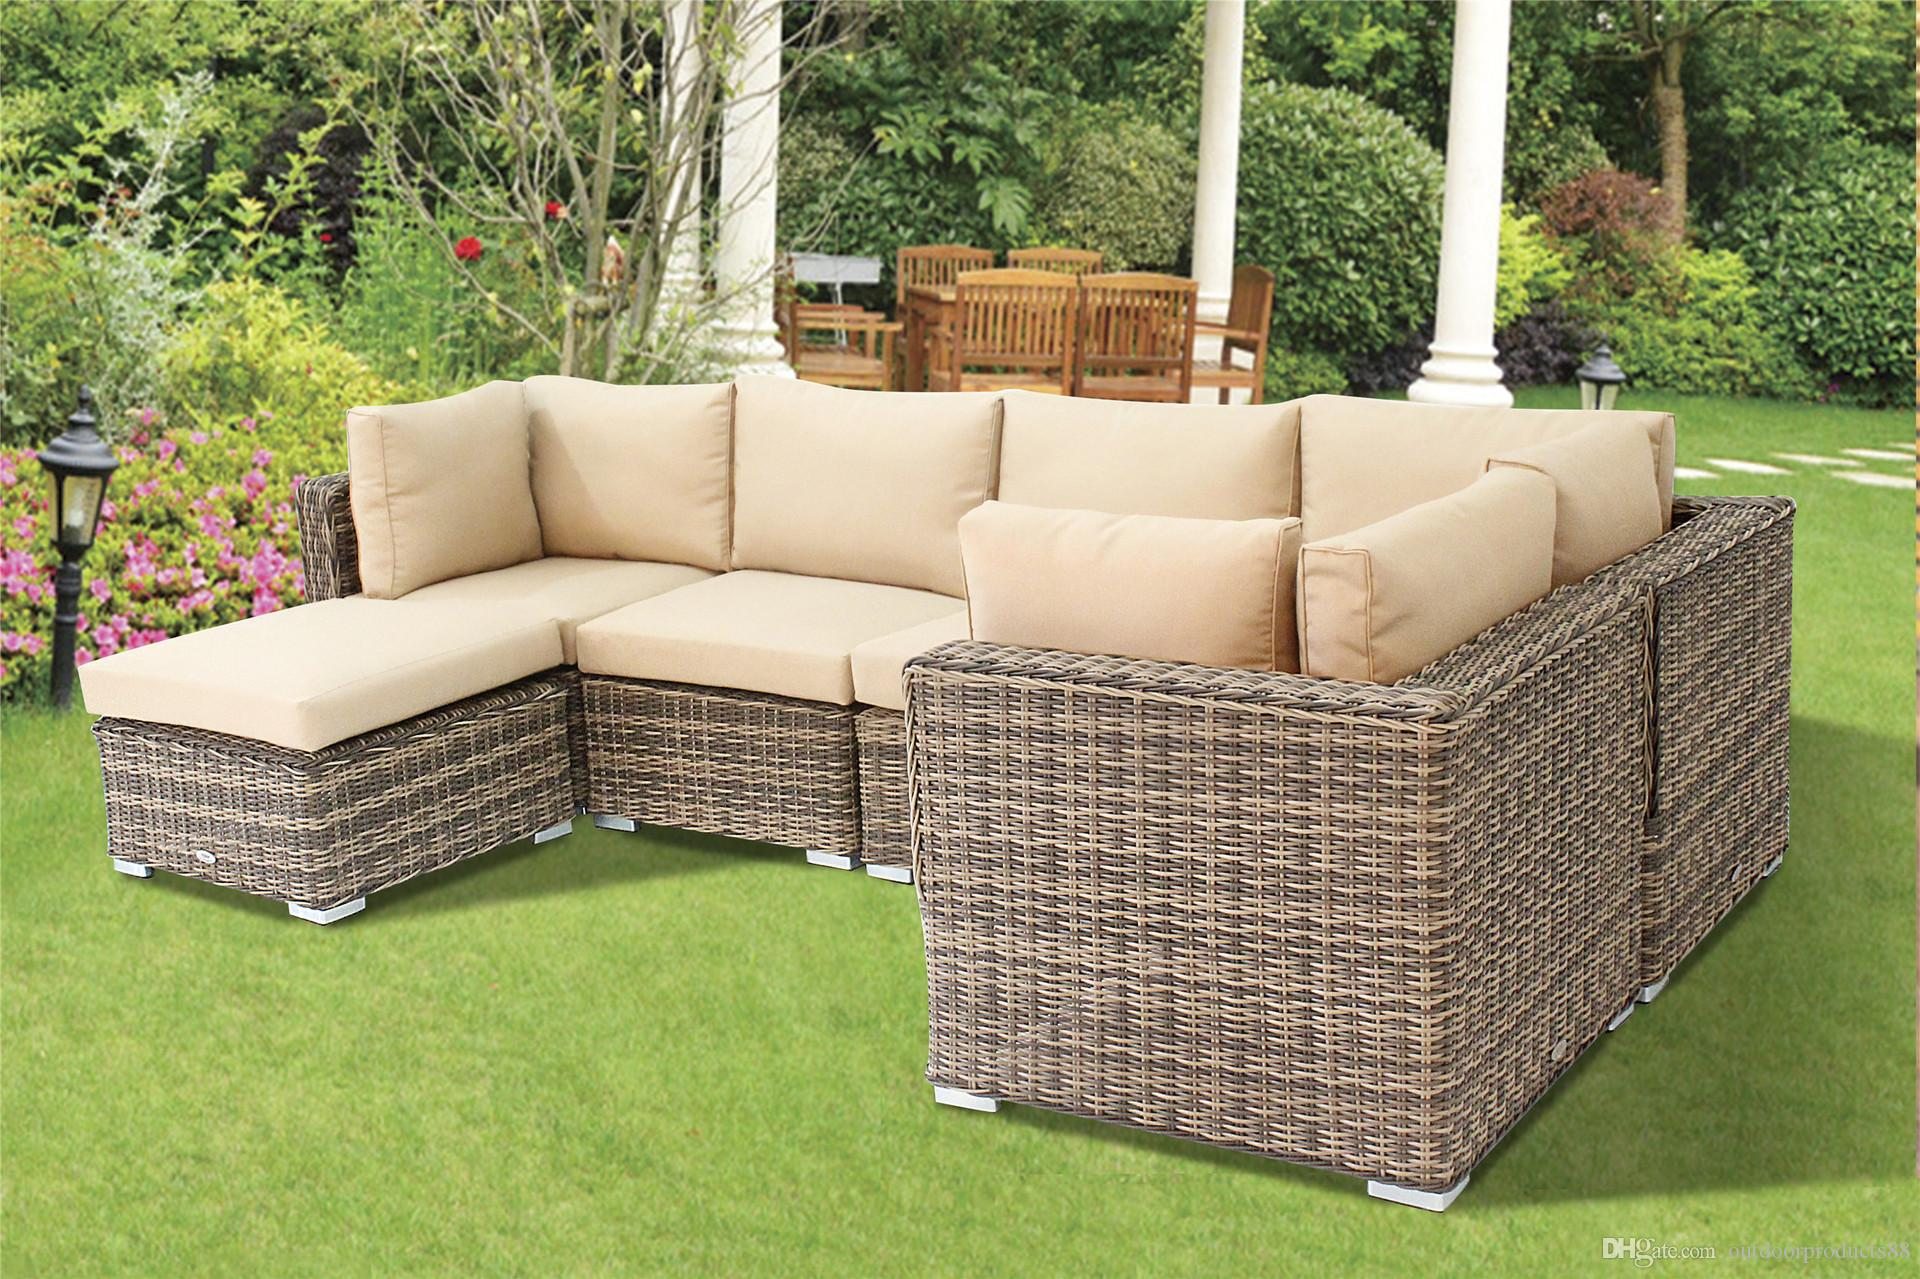 2018 Best Selling Morden Environmental Design Pe Rattan/Wicker Sofa  Set,Wicker Furniture/Garden Patio Furniture/Outdoor Furniture From  Outdoorproducts88, ...